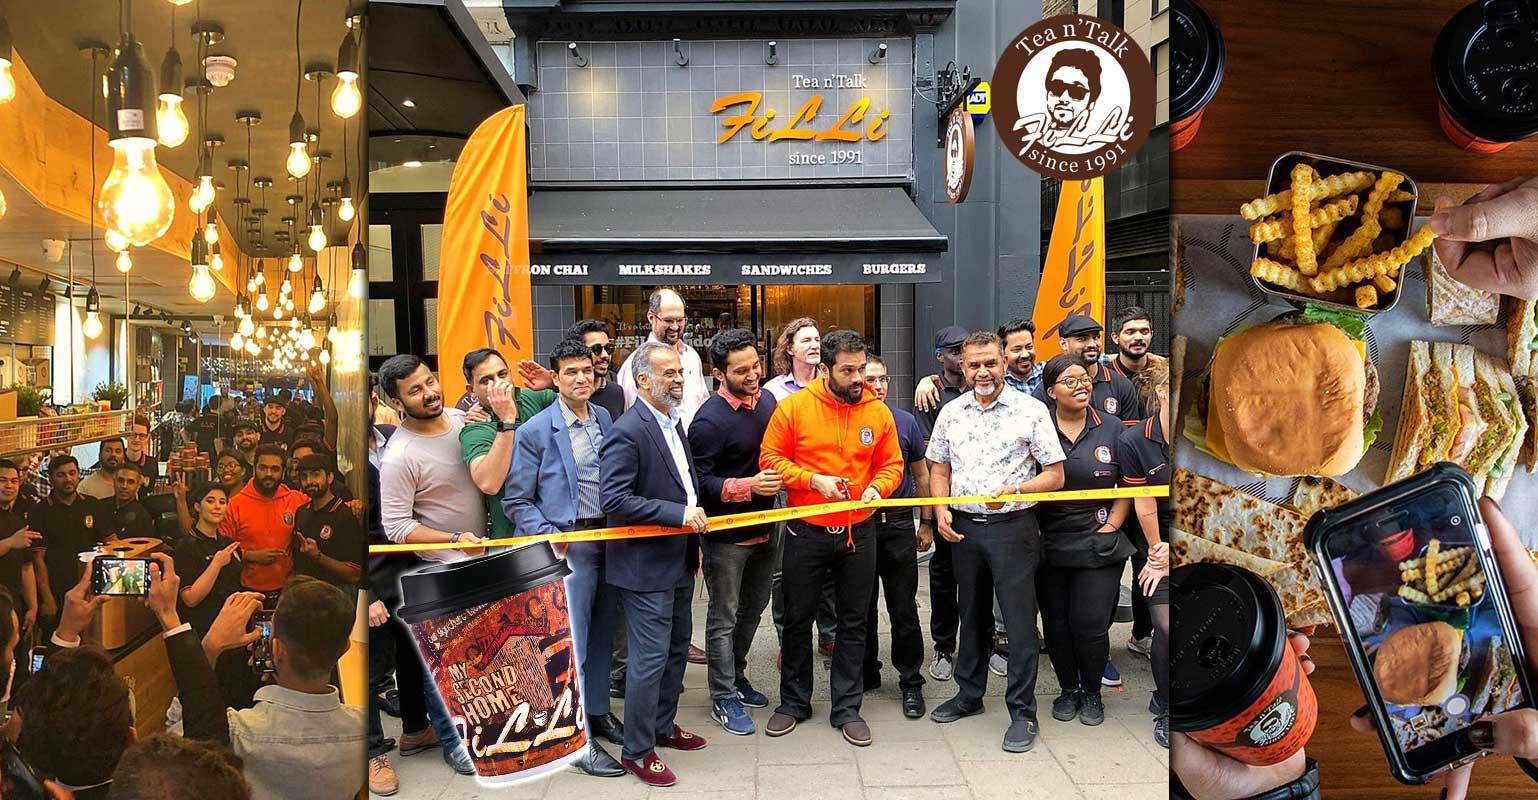 FiLLi Café makes European debut in London